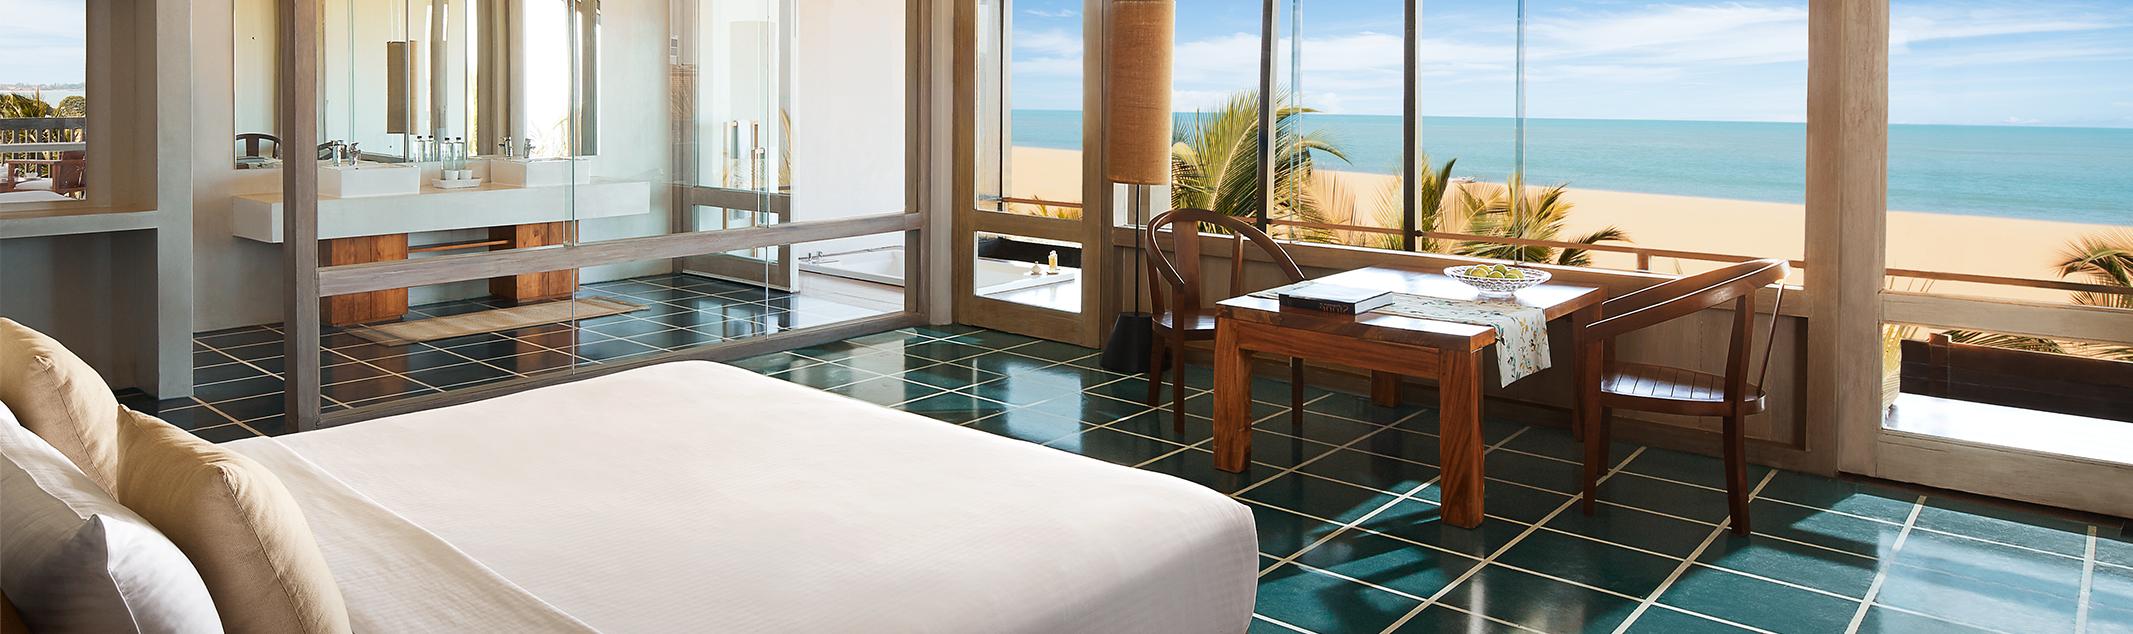 Beach Hotel Negombo, Sri Lanka | Jetwing Blue Negombo | Official Site